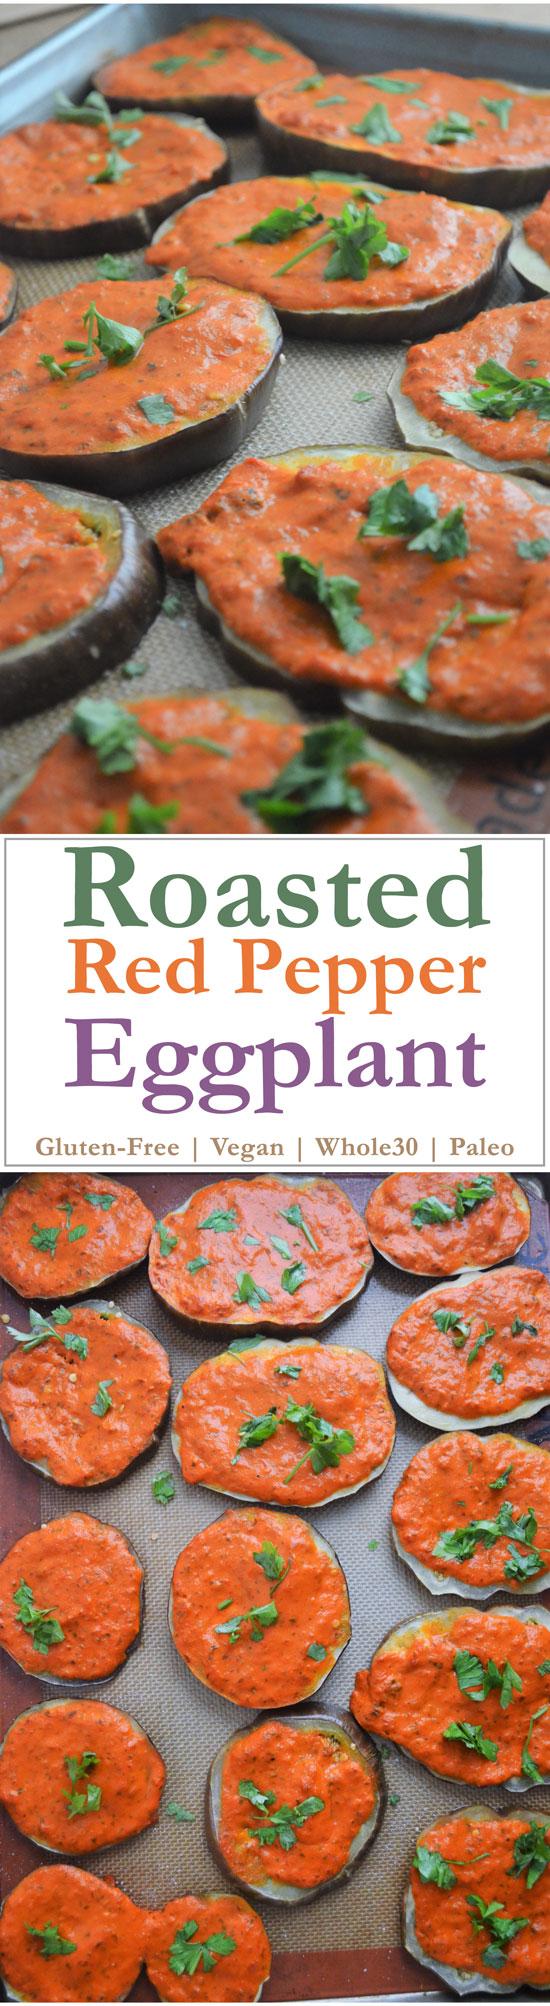 mediterranean eggplant red pepper sauce gluten free grain free vegan dairy free whole30 paleo